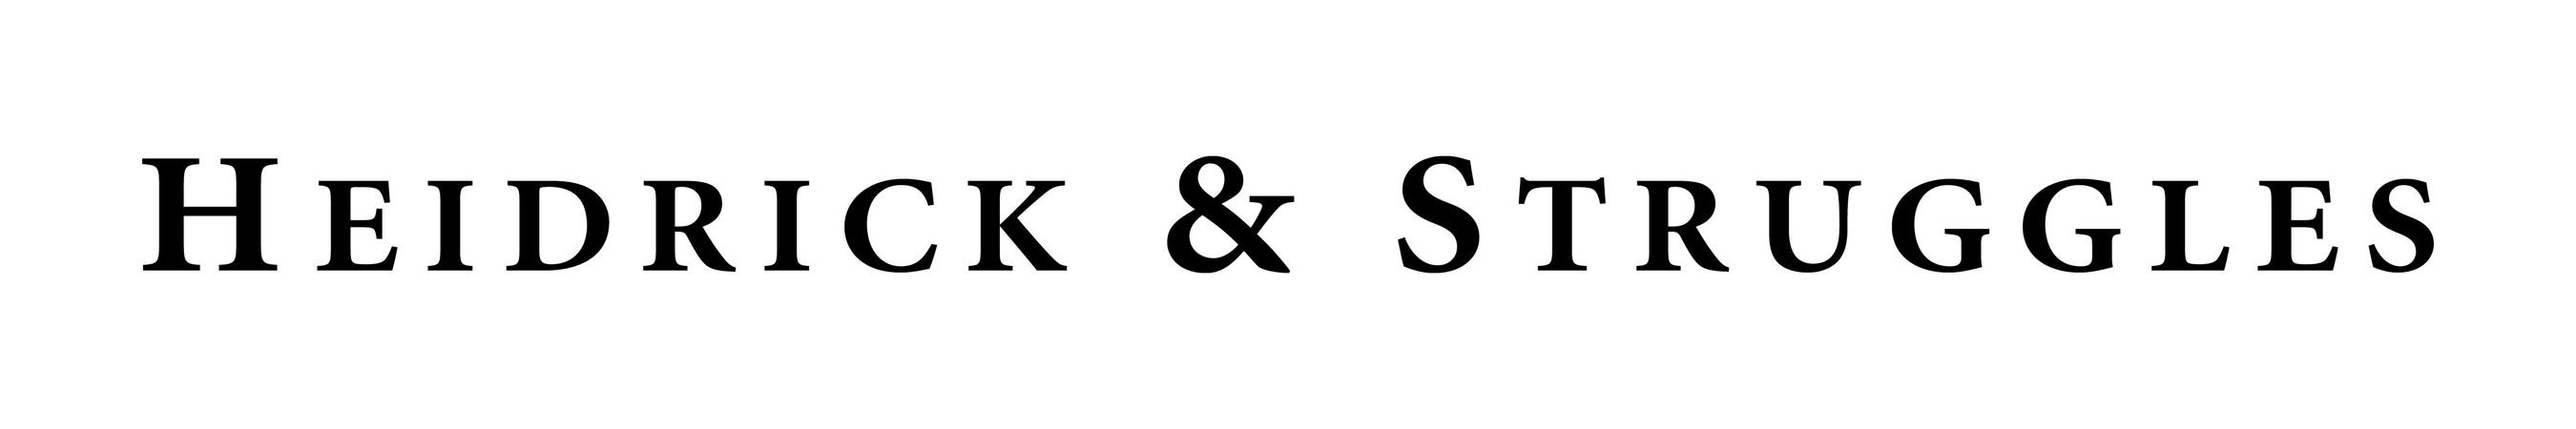 Heidrick & Struggles Logo (PRNewsFoto/Heidrick & Struggles)